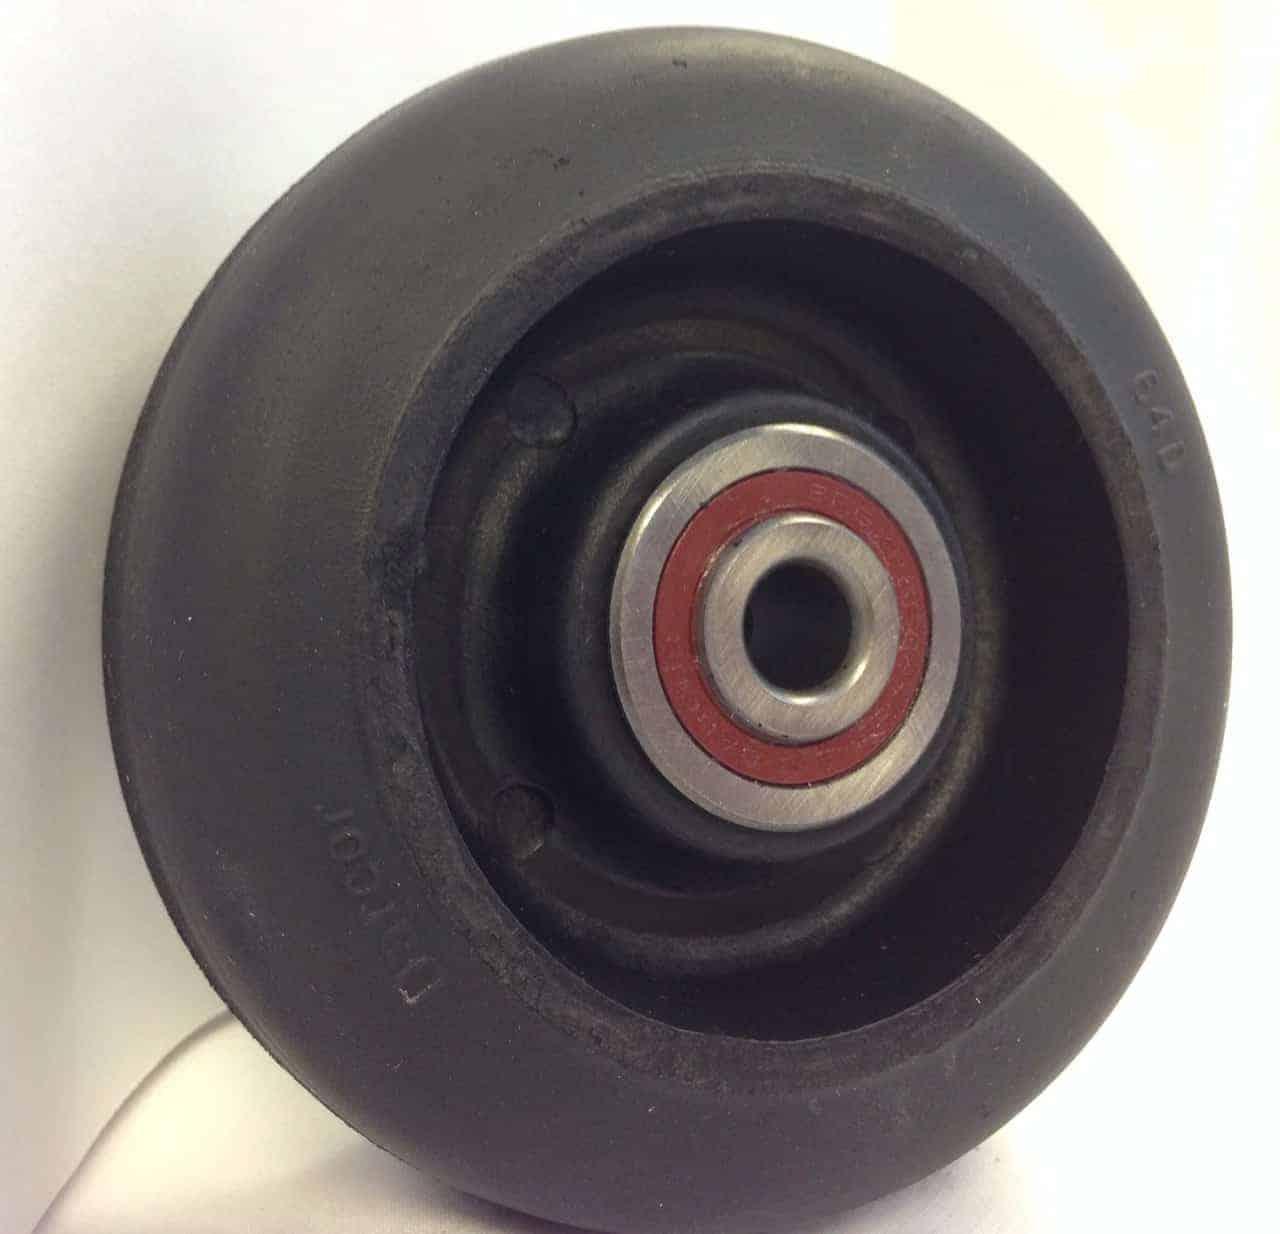 4″ Neoprene Wheel With 3/8 Precision Sealed Ball Bearing 1-1/2 Hub 225 Lbs Capacity